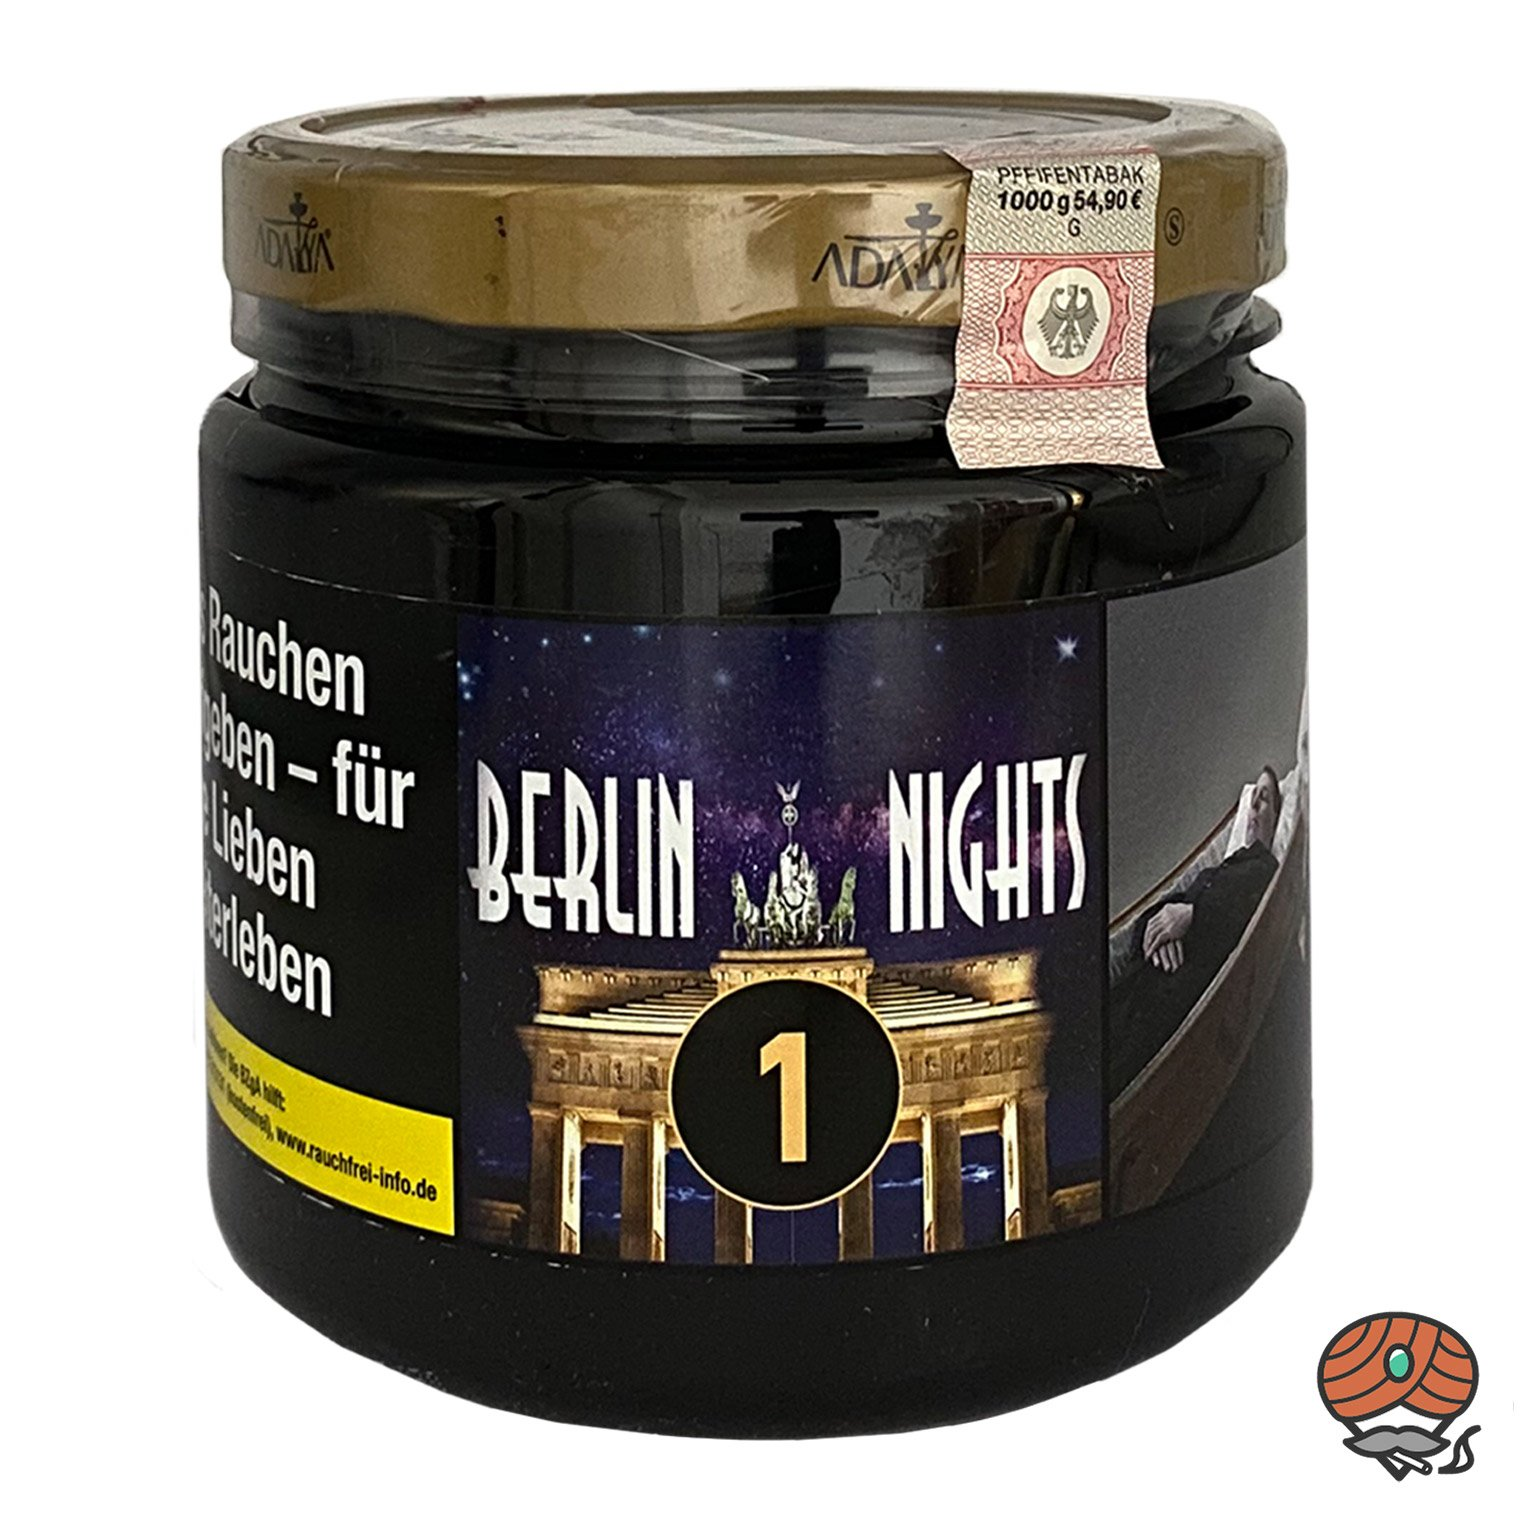 ADALYA BERLIN NIGHTS #1 - 1000 g Shisha Tabak